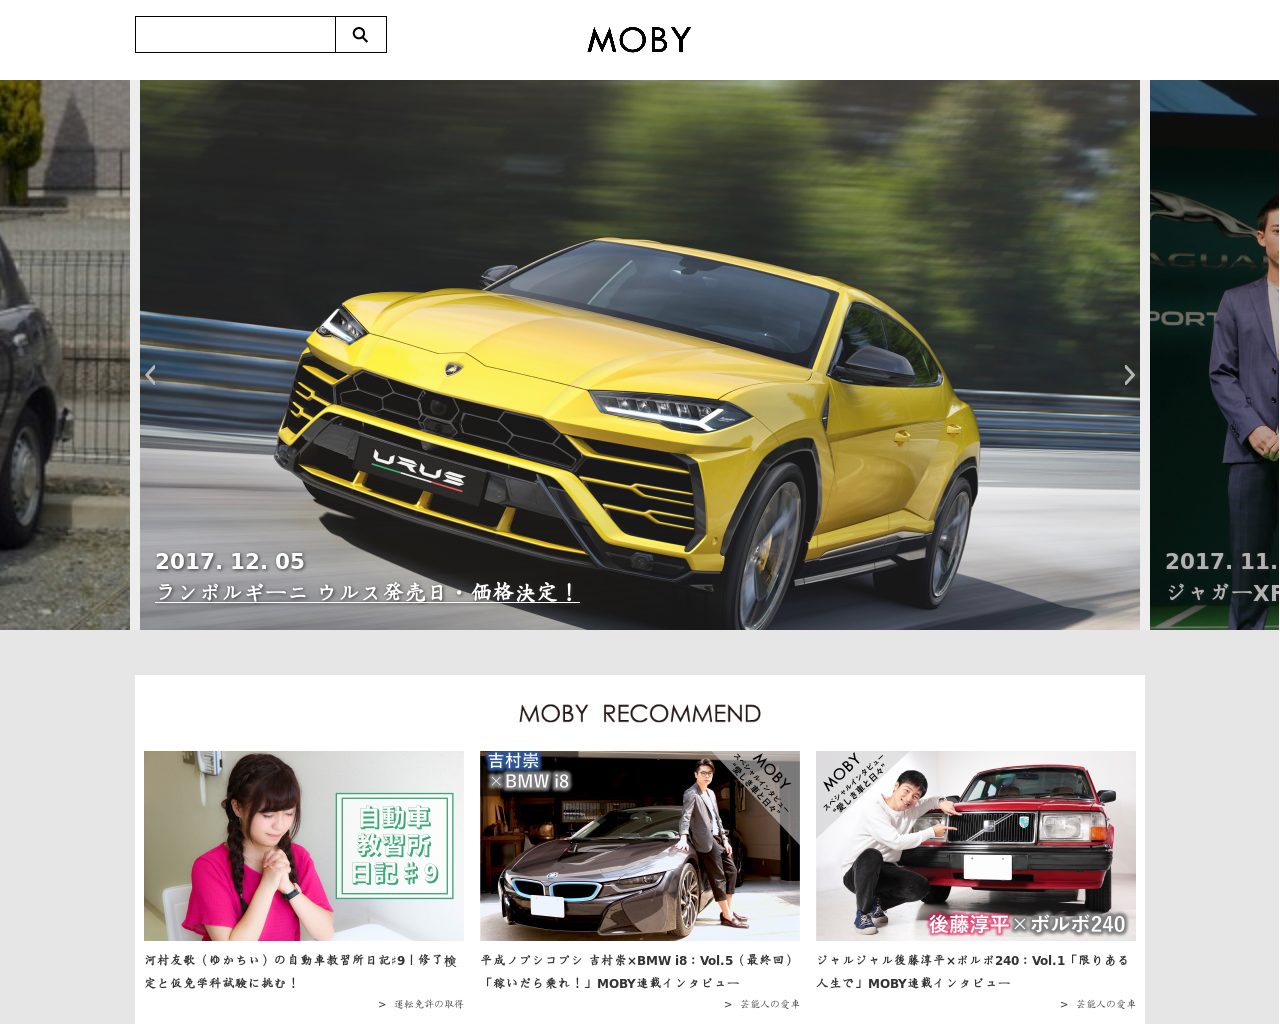 car-moby.jp(2017/12/01 13:51:10)